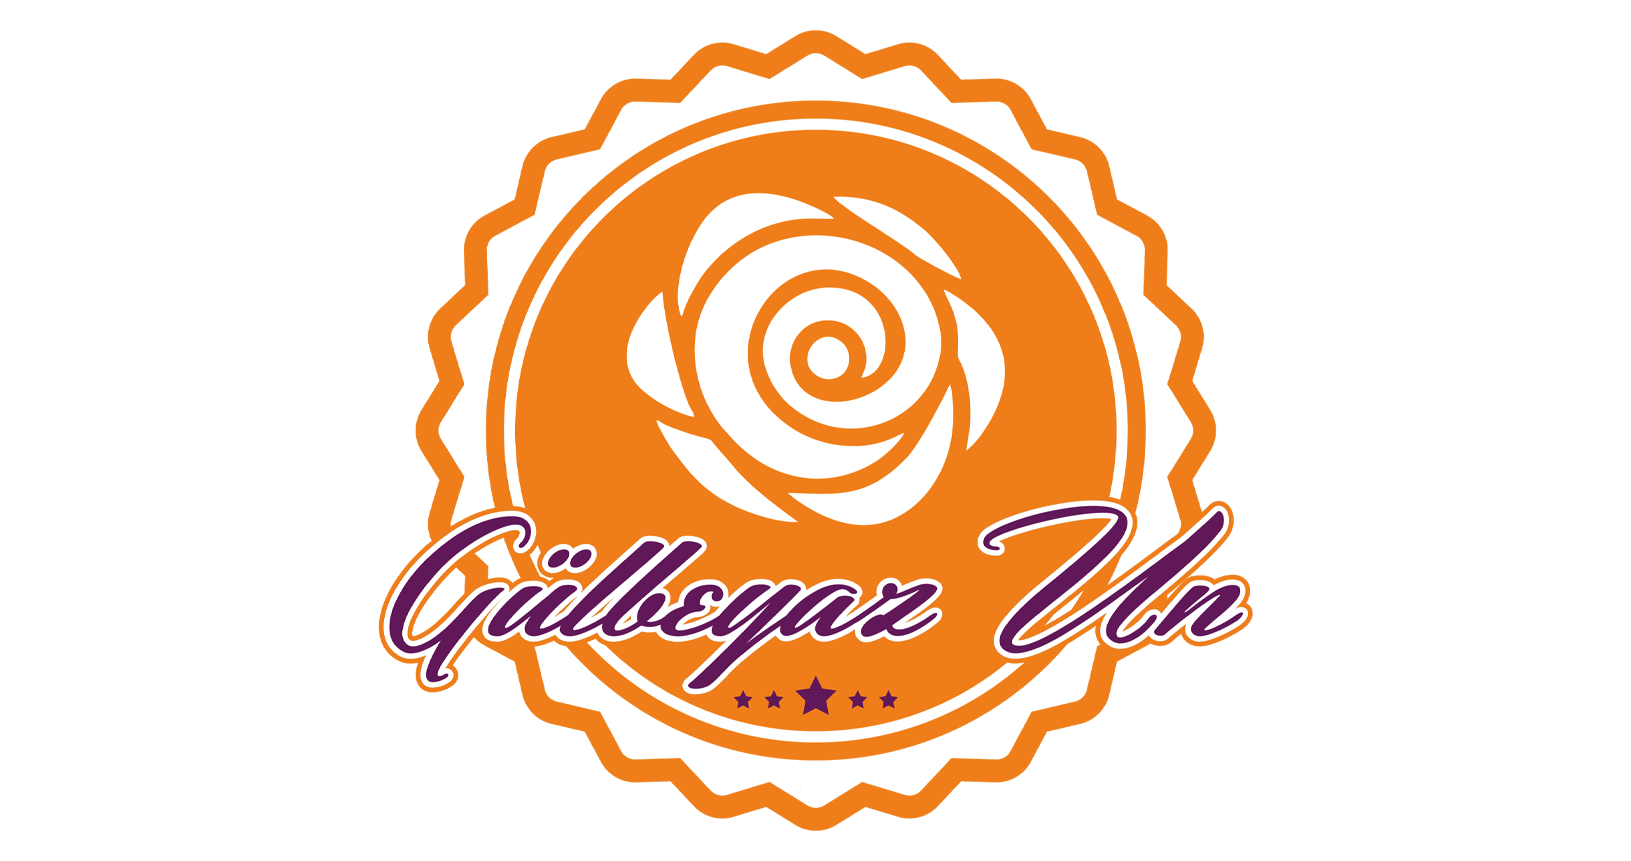 kaptanlar-gulbeyaz-un-logo